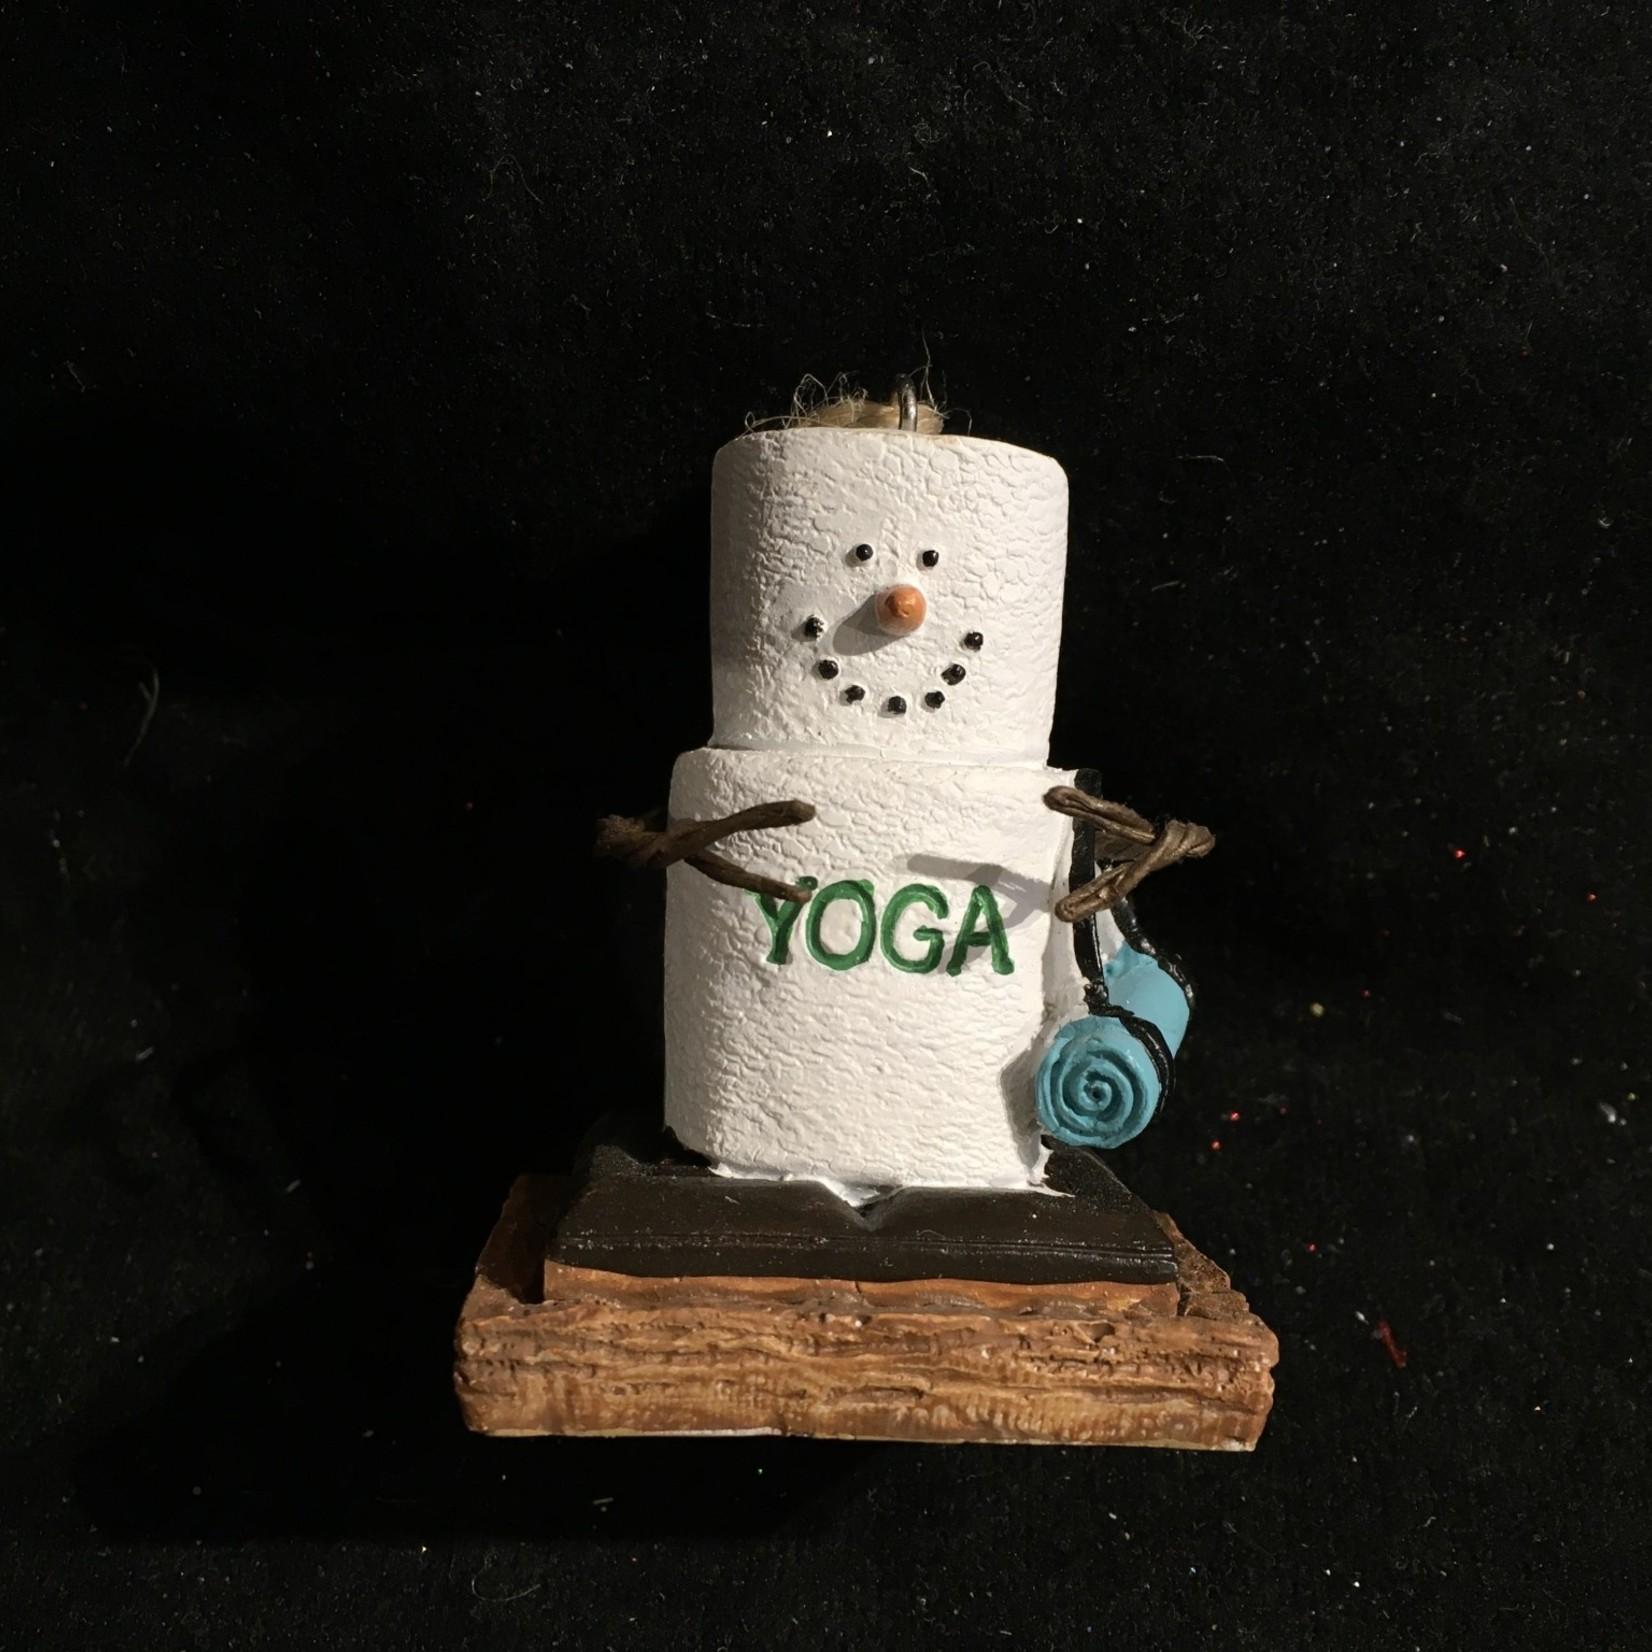 **S'Mores Yoga Ornament